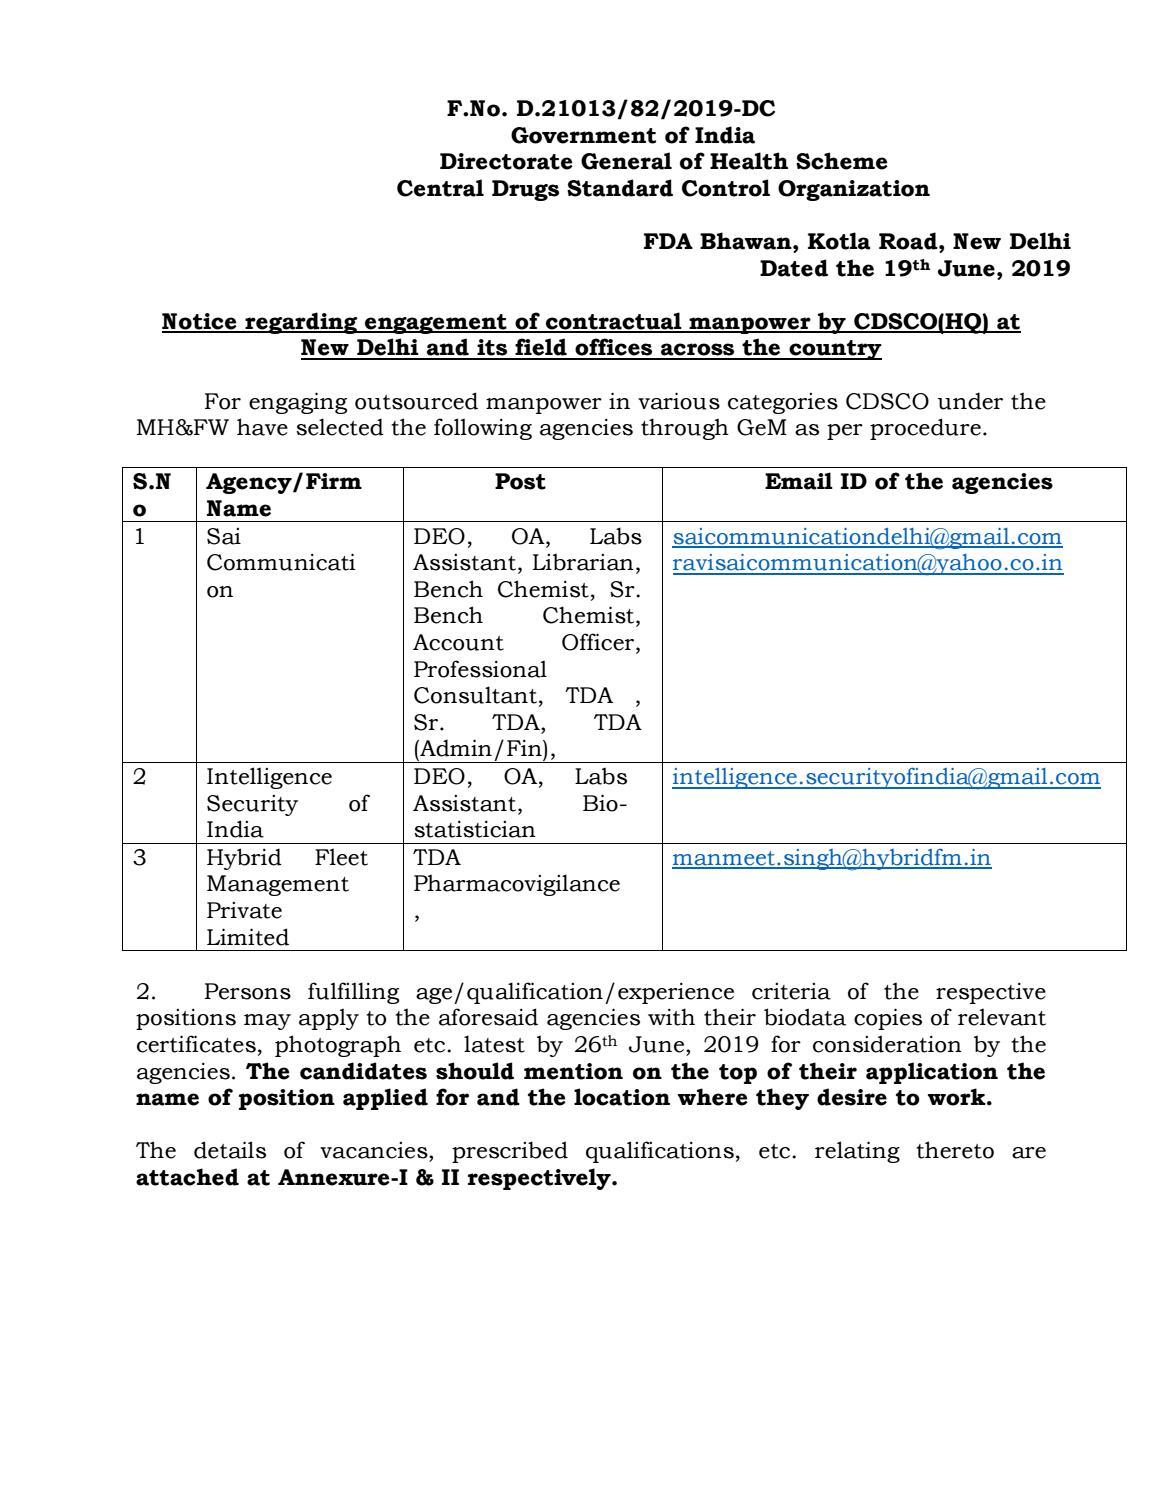 Govt CDSCO Biotech / Microbio / Mol  Biology Jobs With Rs  80,000 pm